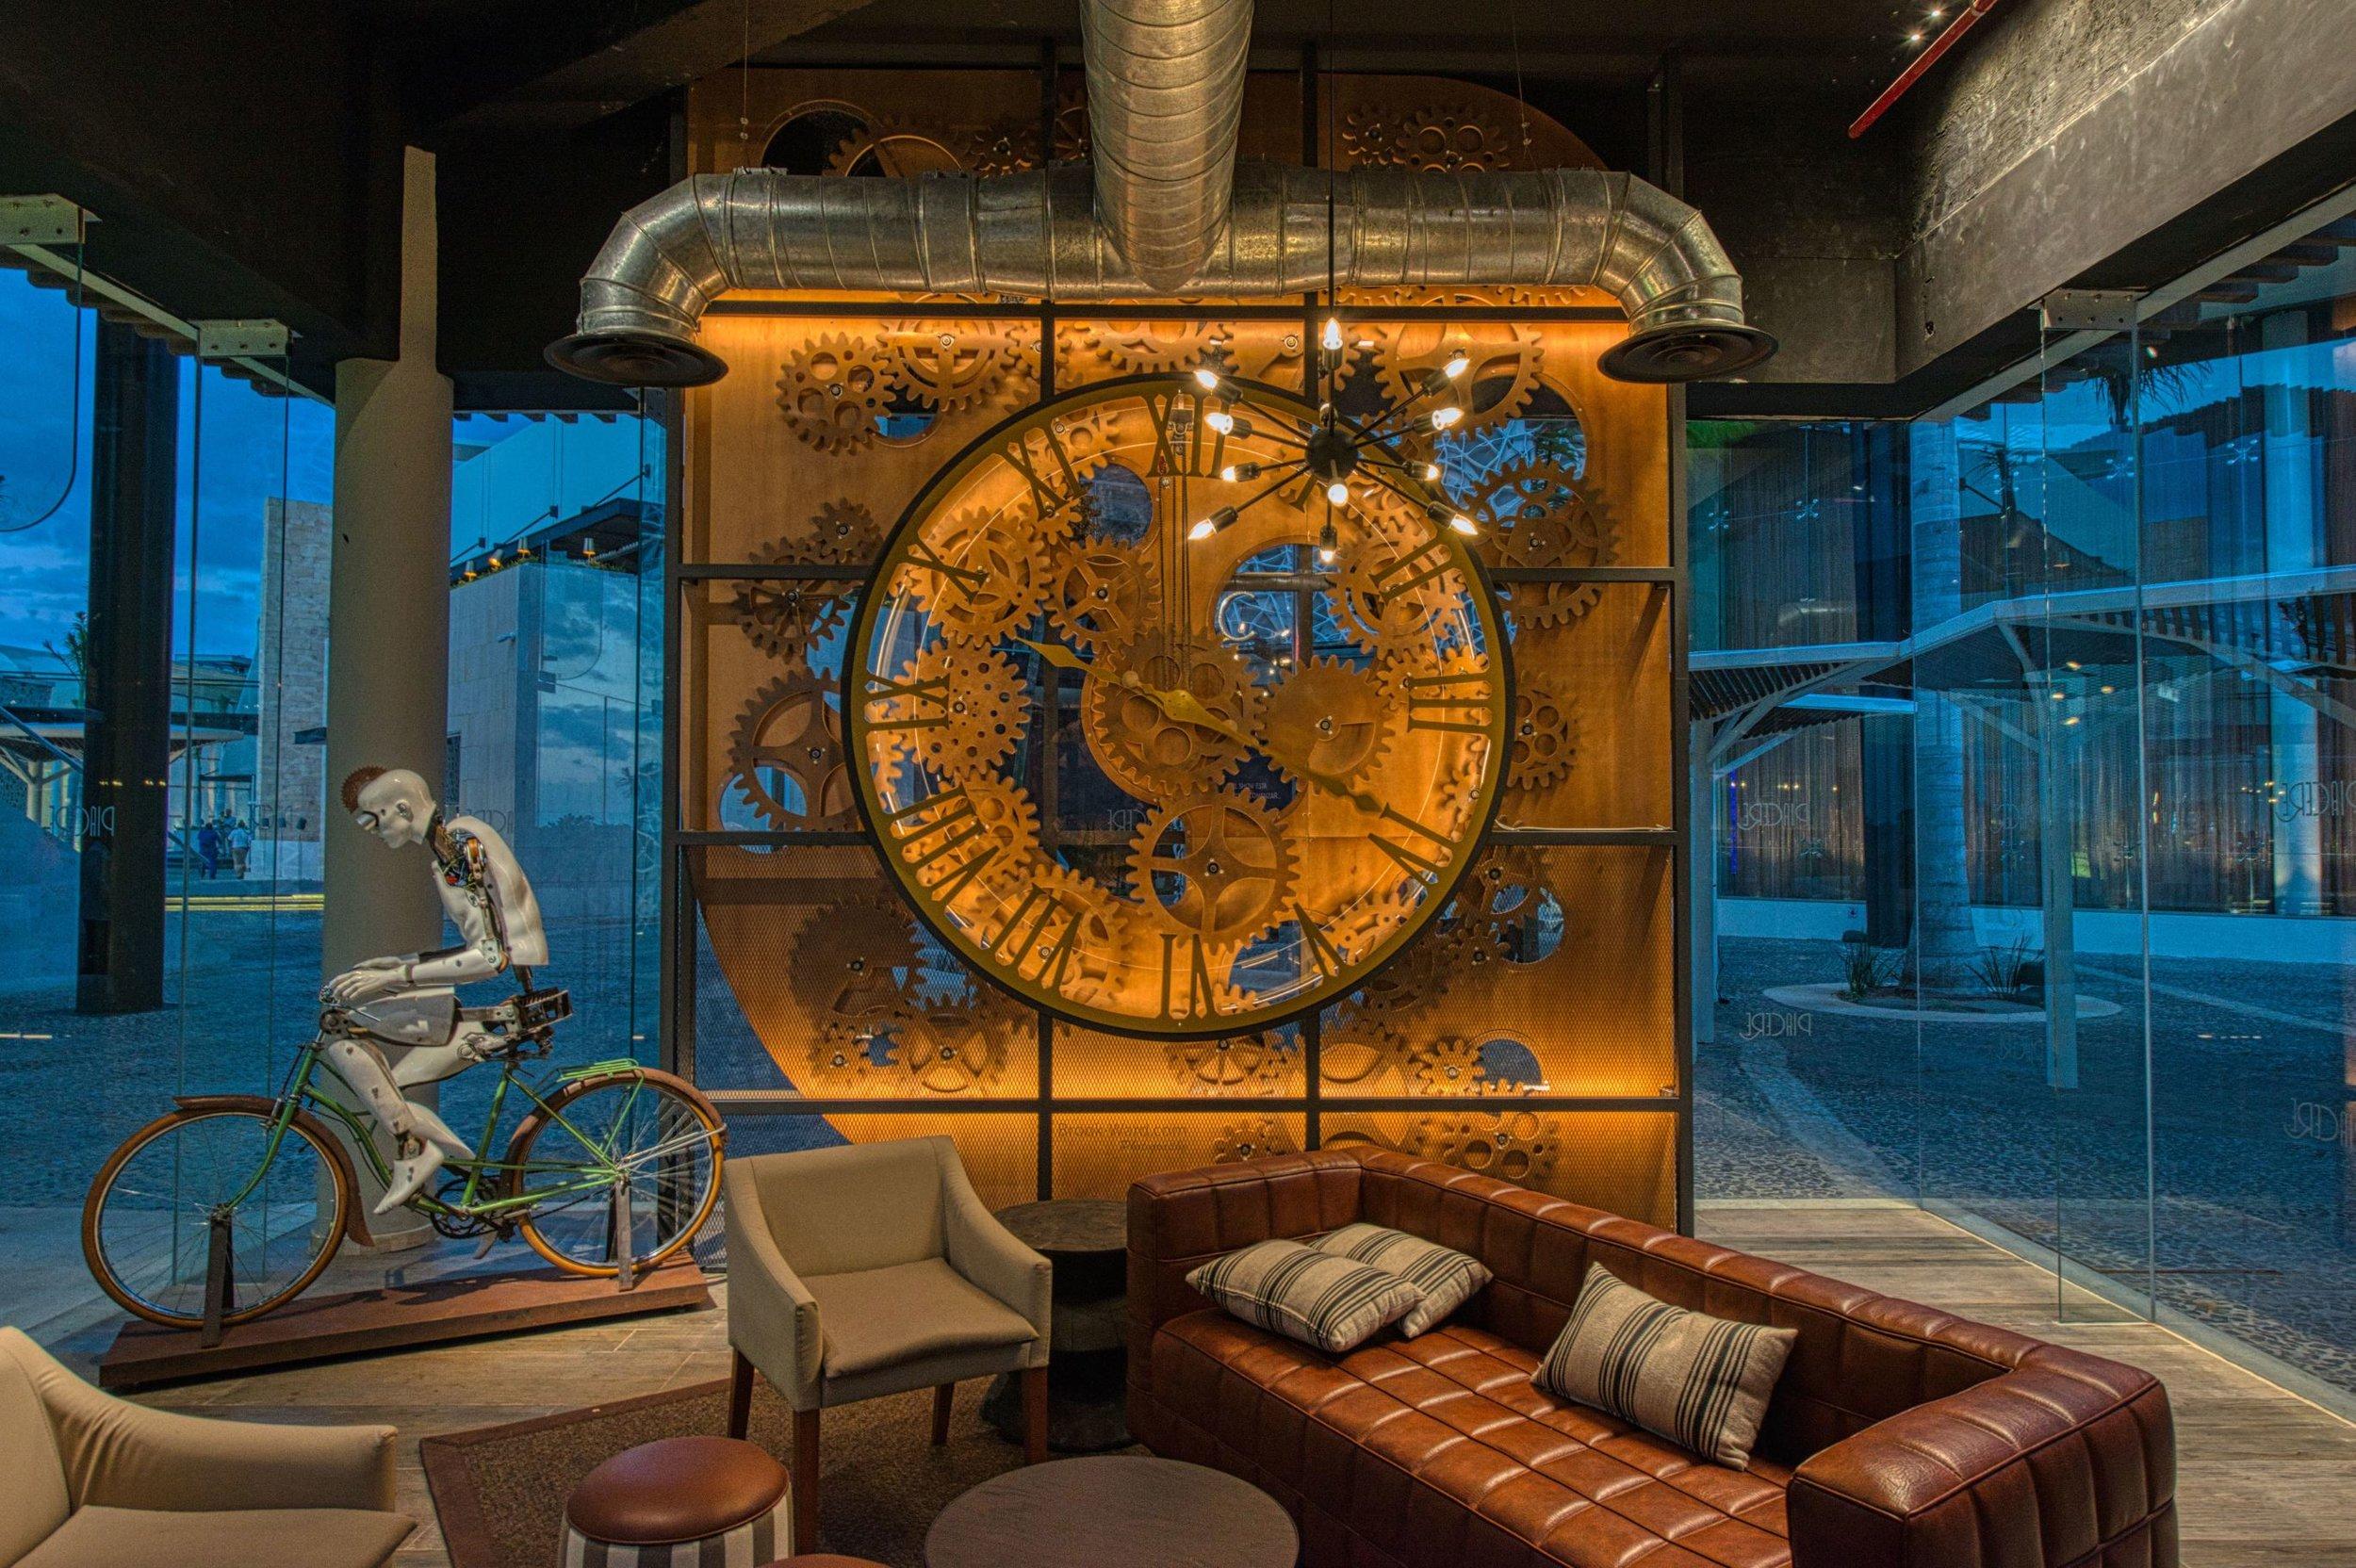 Grand Palladium Cafe